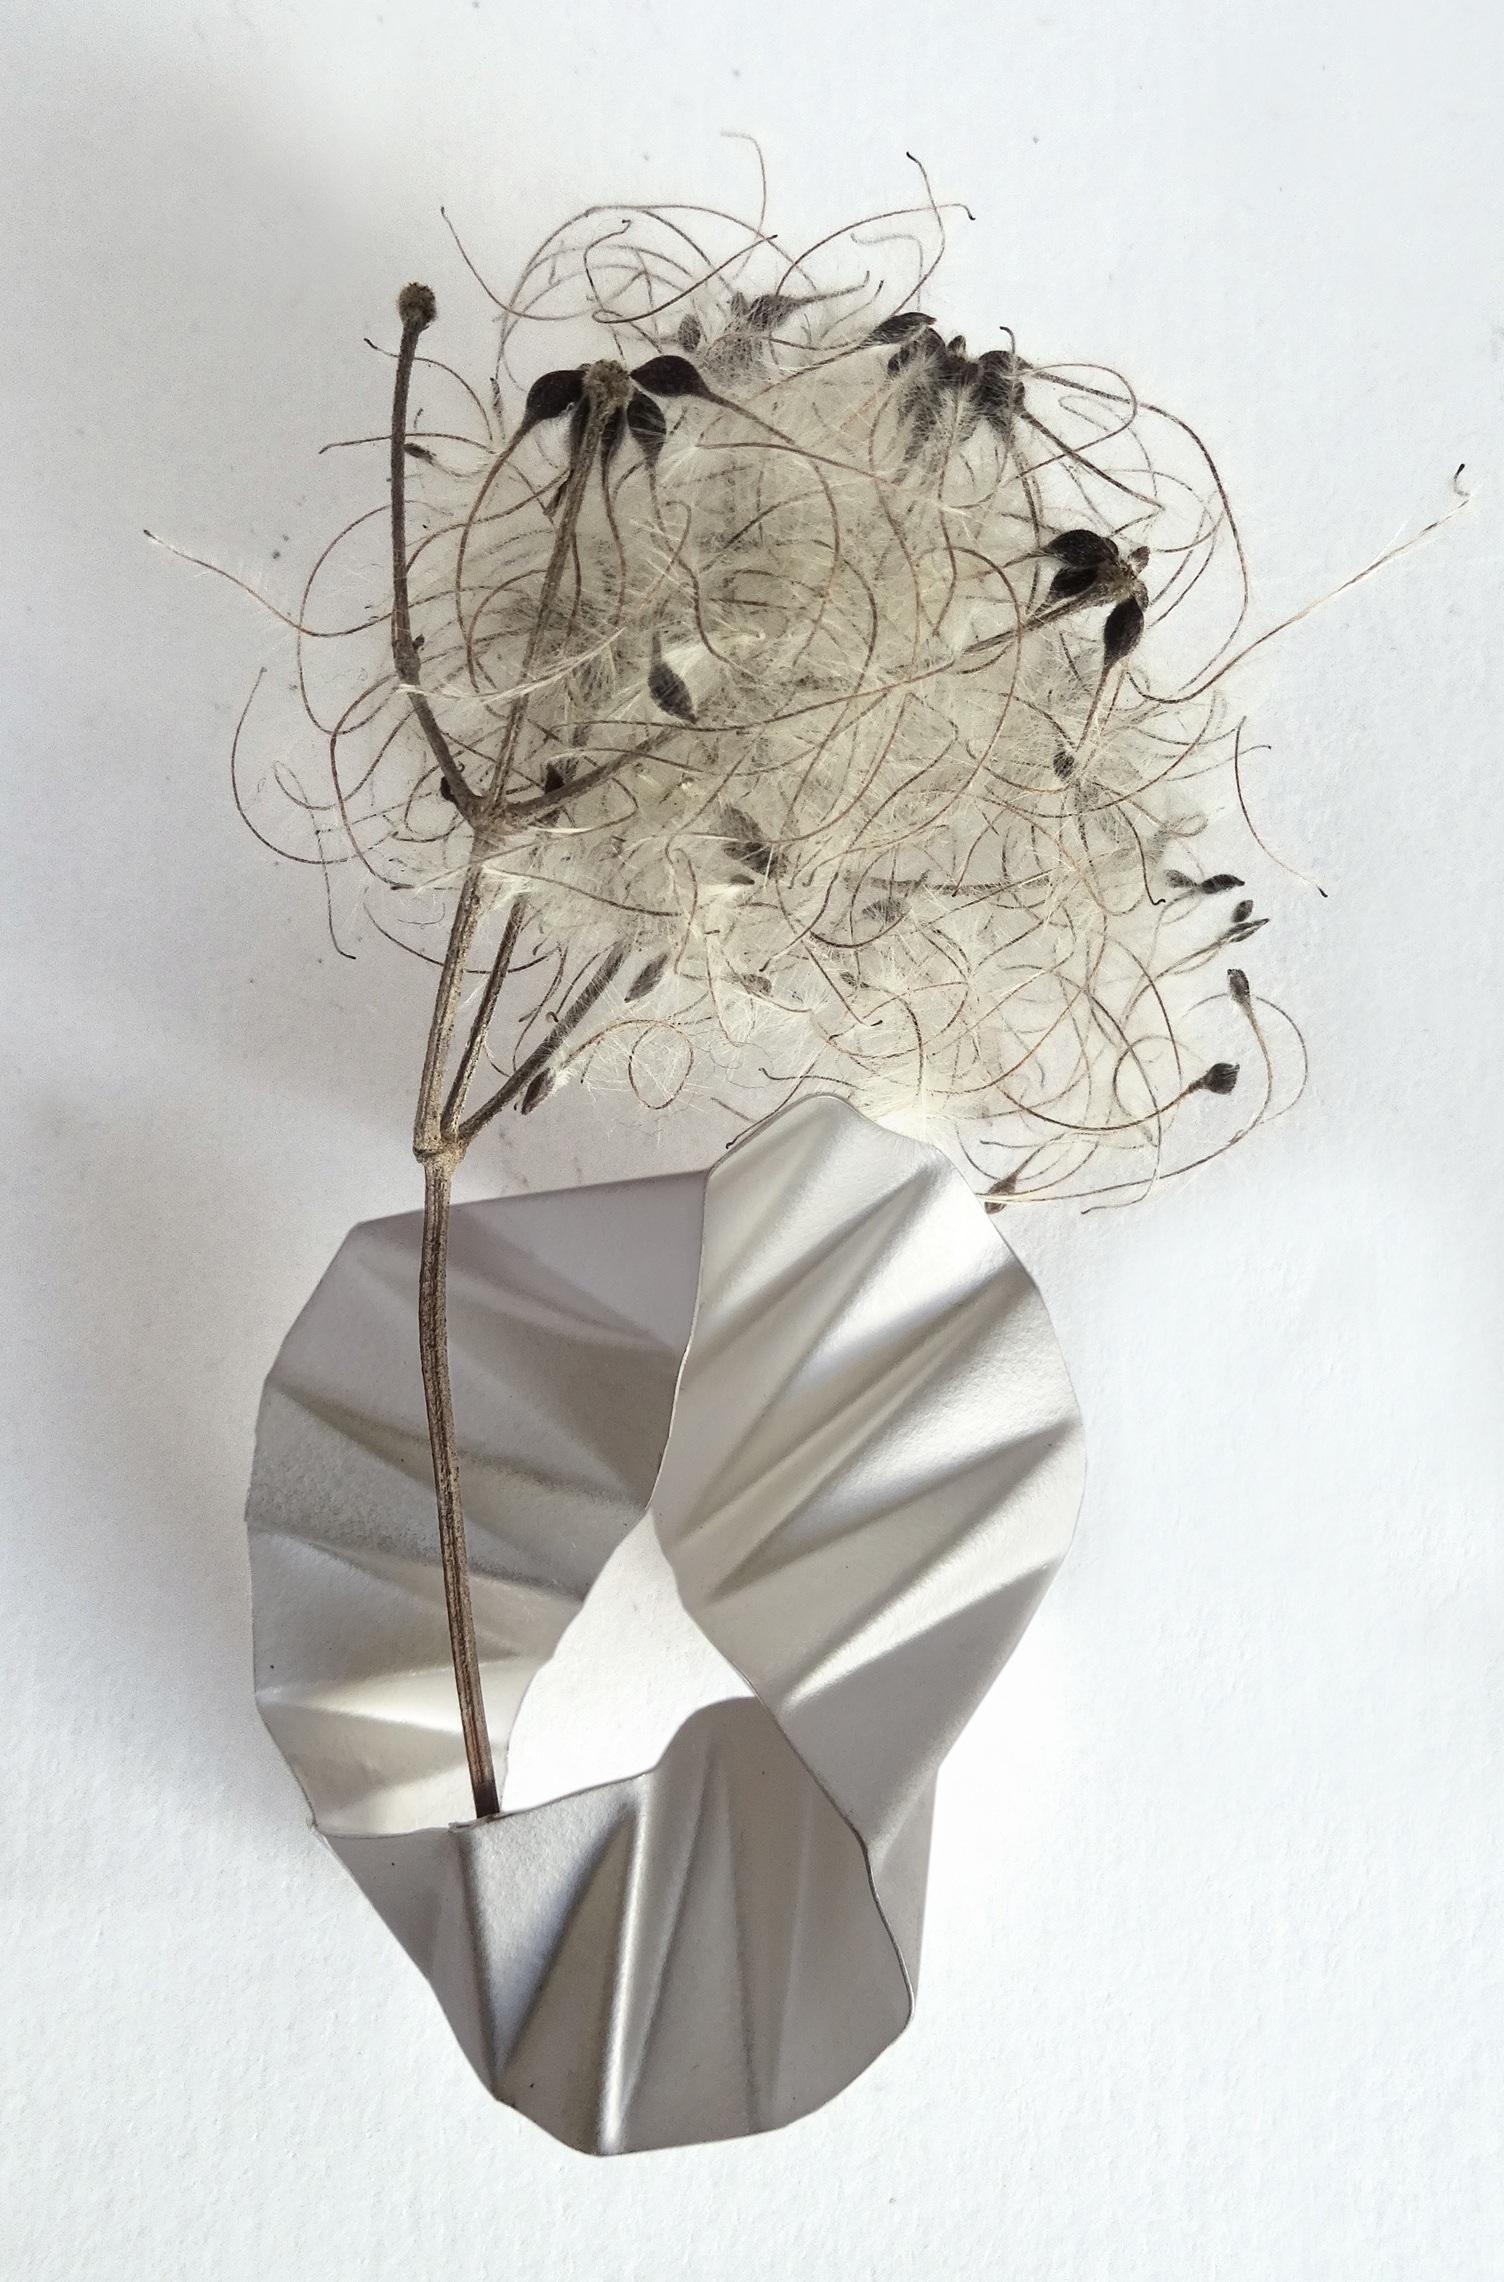 Viki Pearce – Image 2 – 300